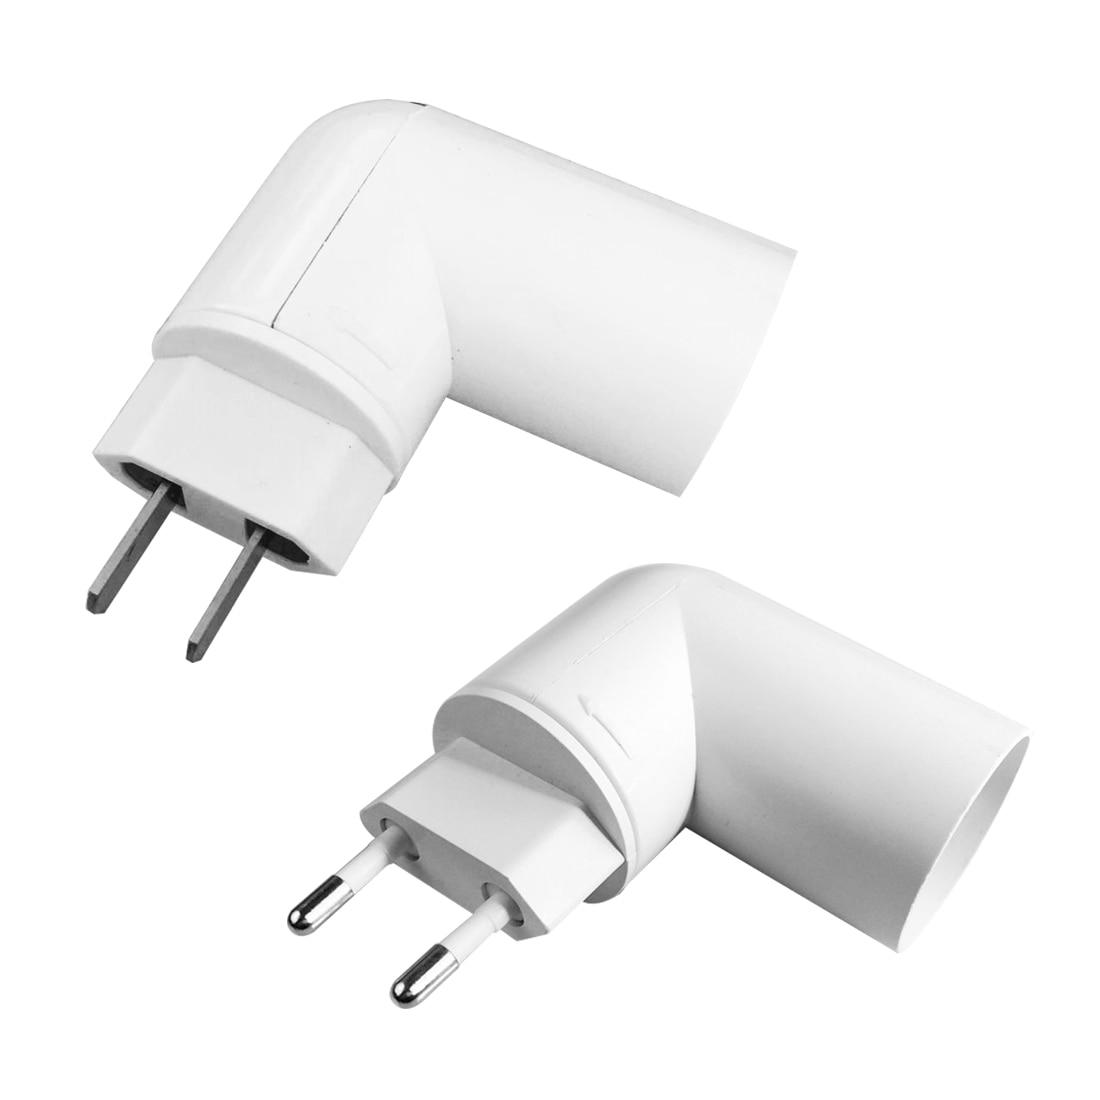 Initiative Centechia Us/eu Plug Pbt Pp To E27 White Base Led Light Lamp Holder Bulb Adapter Converter Socket To E27 Accessories & Parts Consumer Electronics